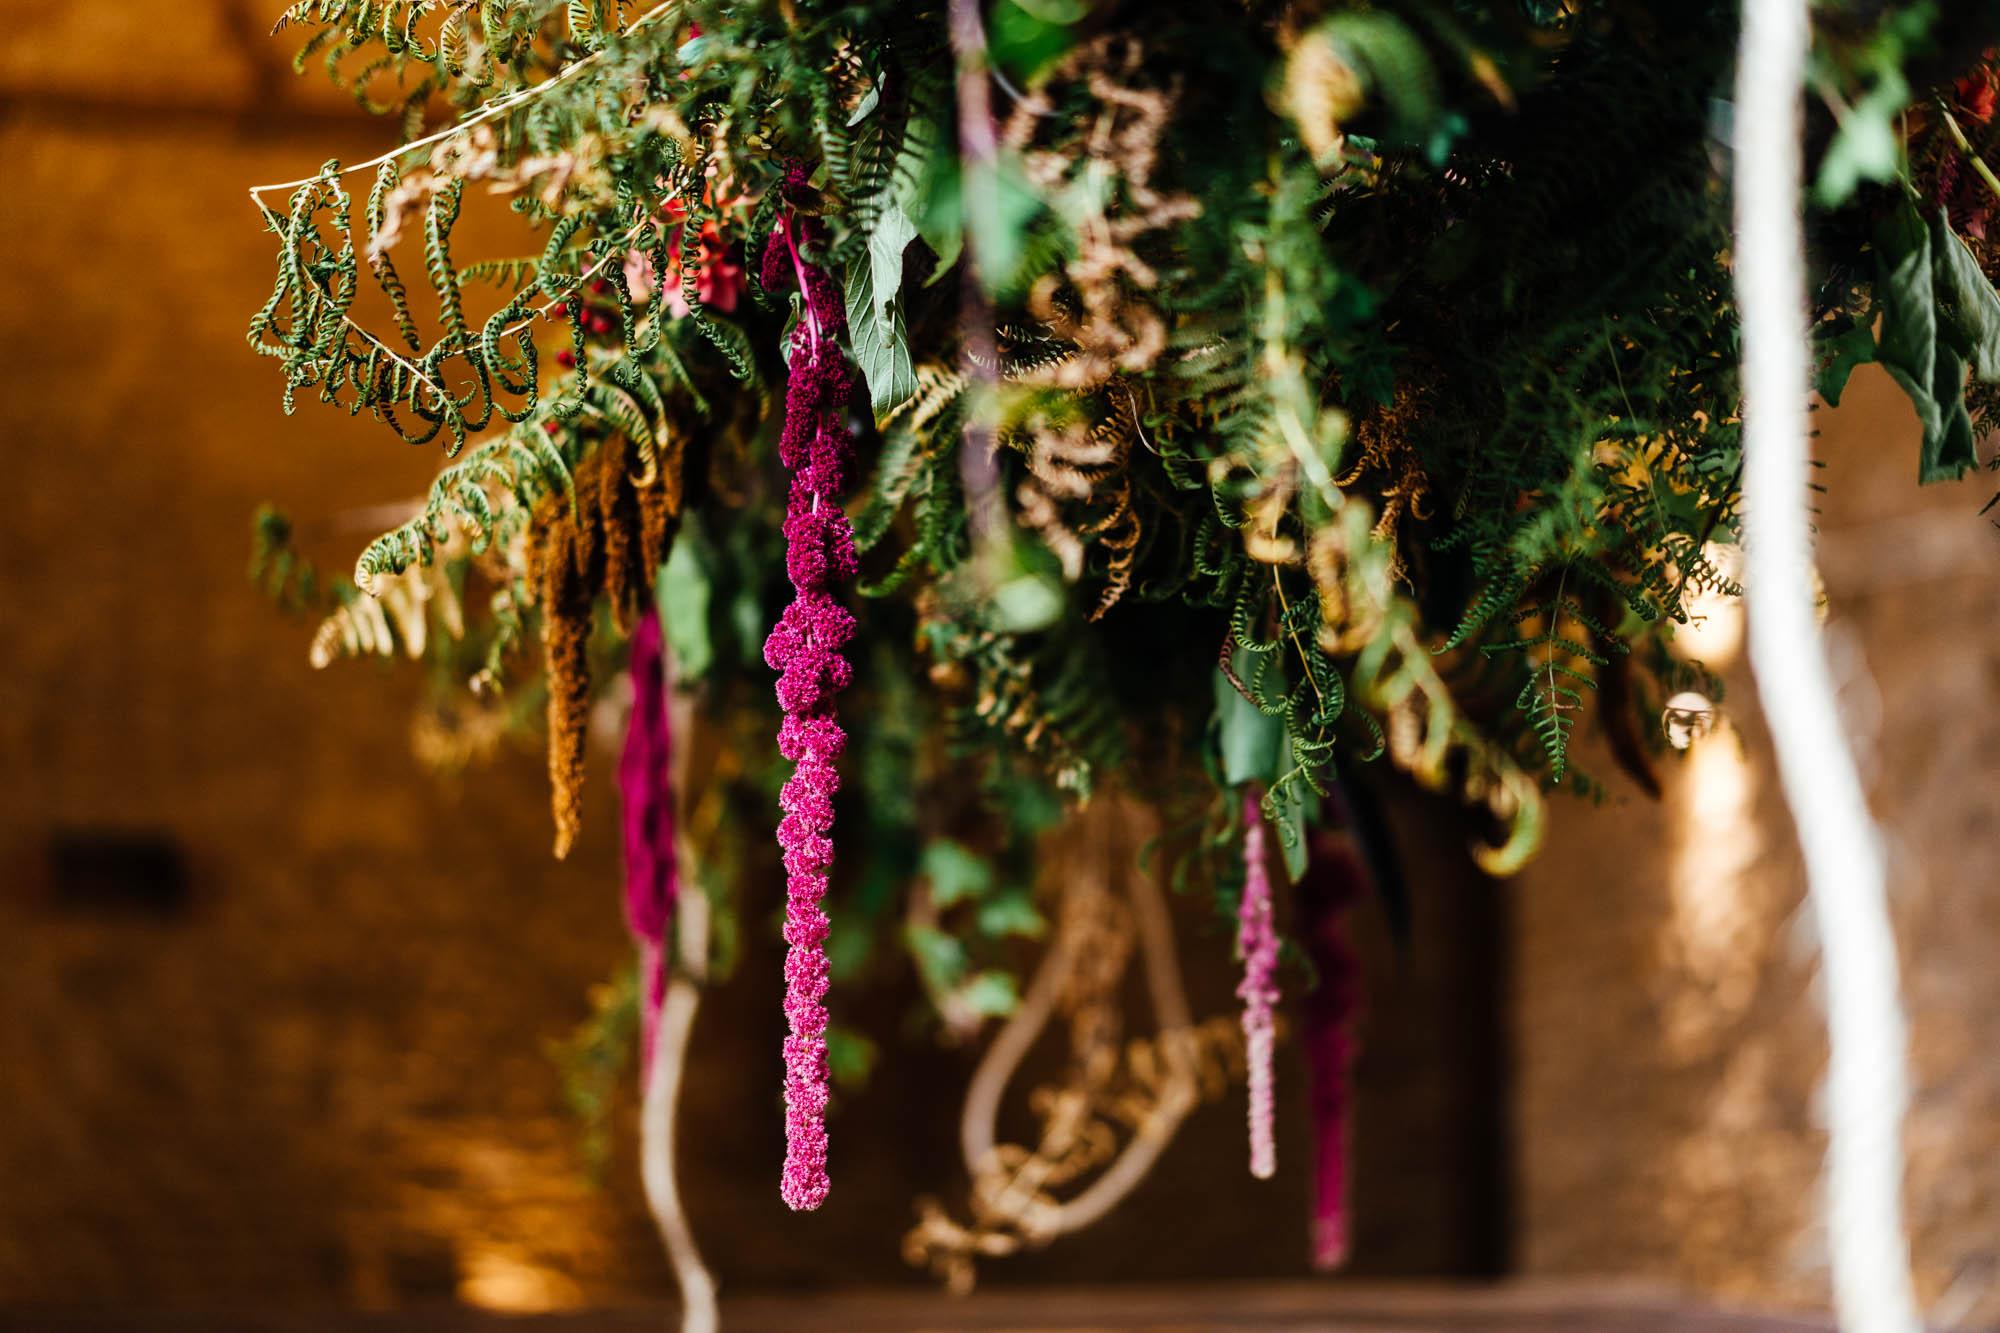 huntsmill-farm-wedding-inspiration-1